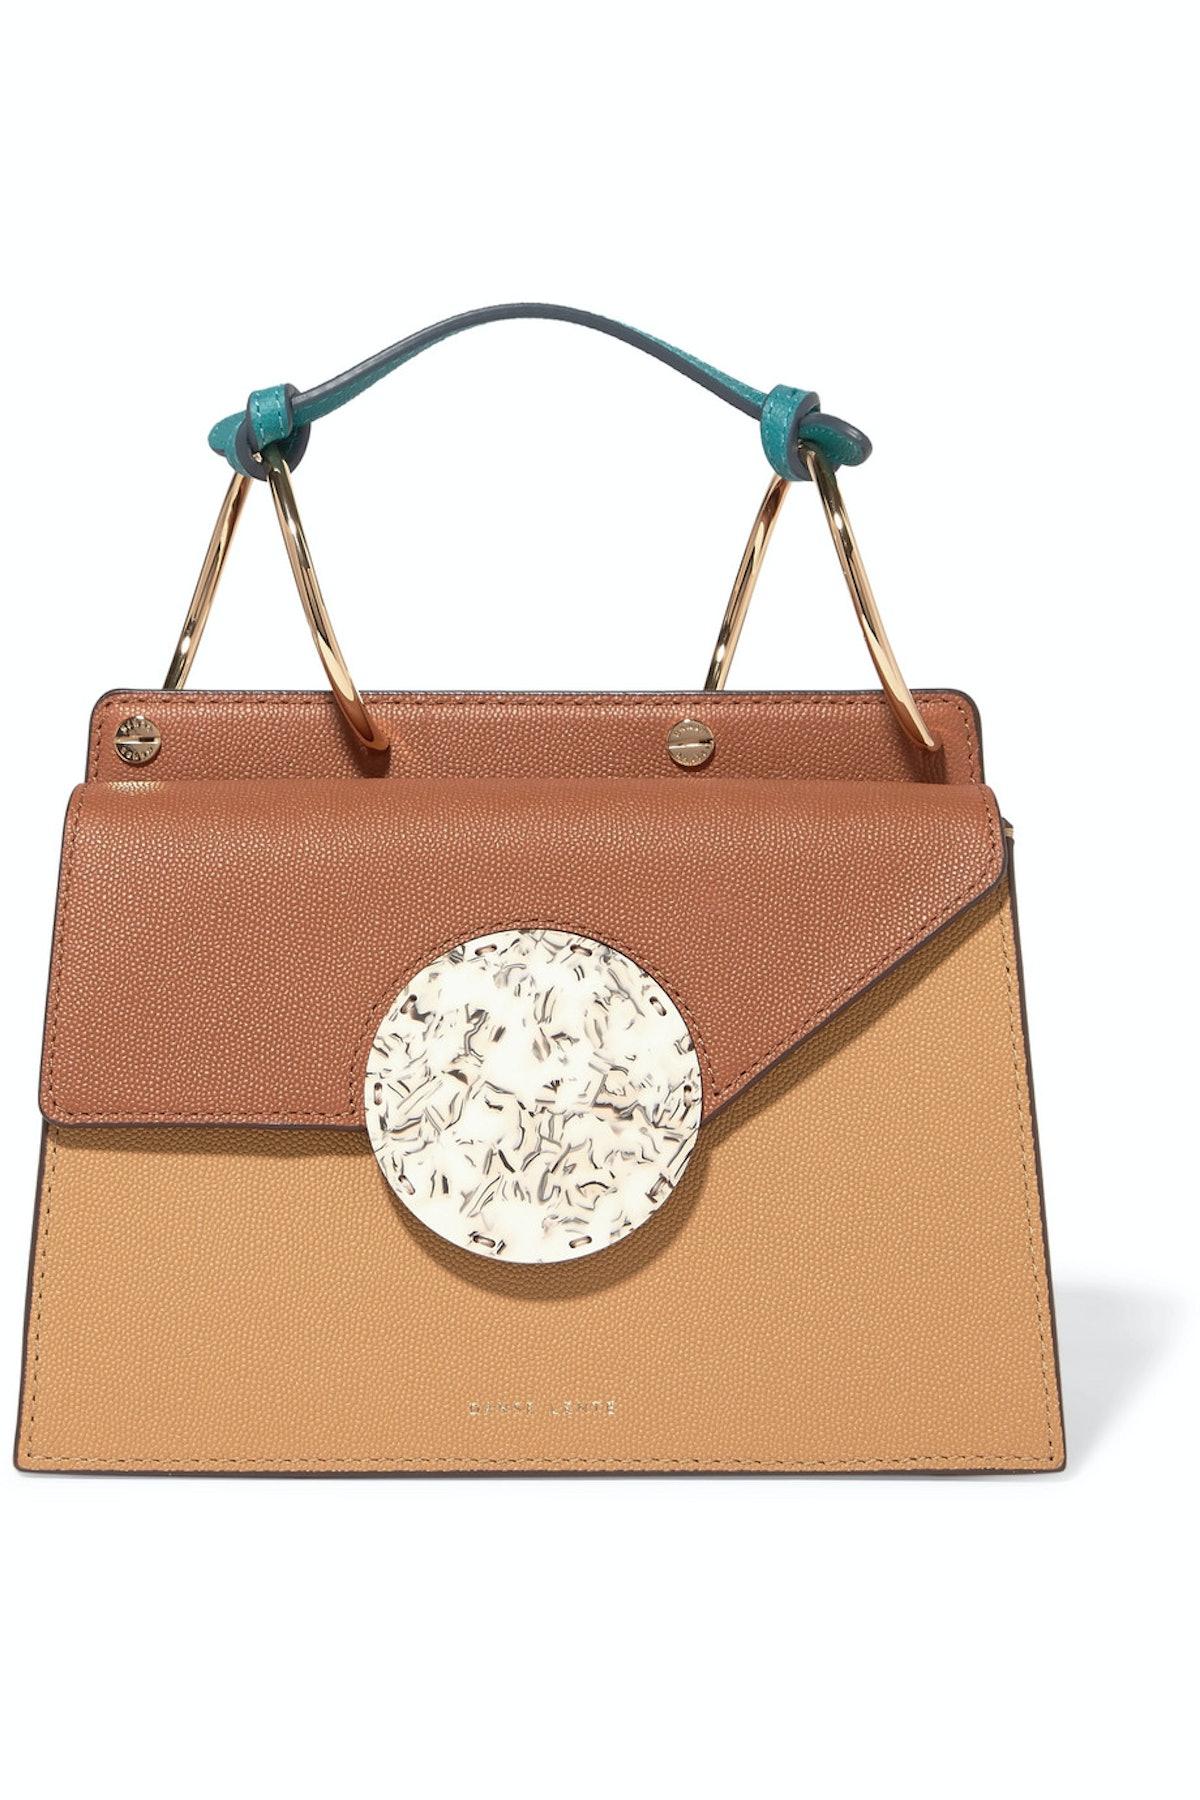 Pheobe Bag